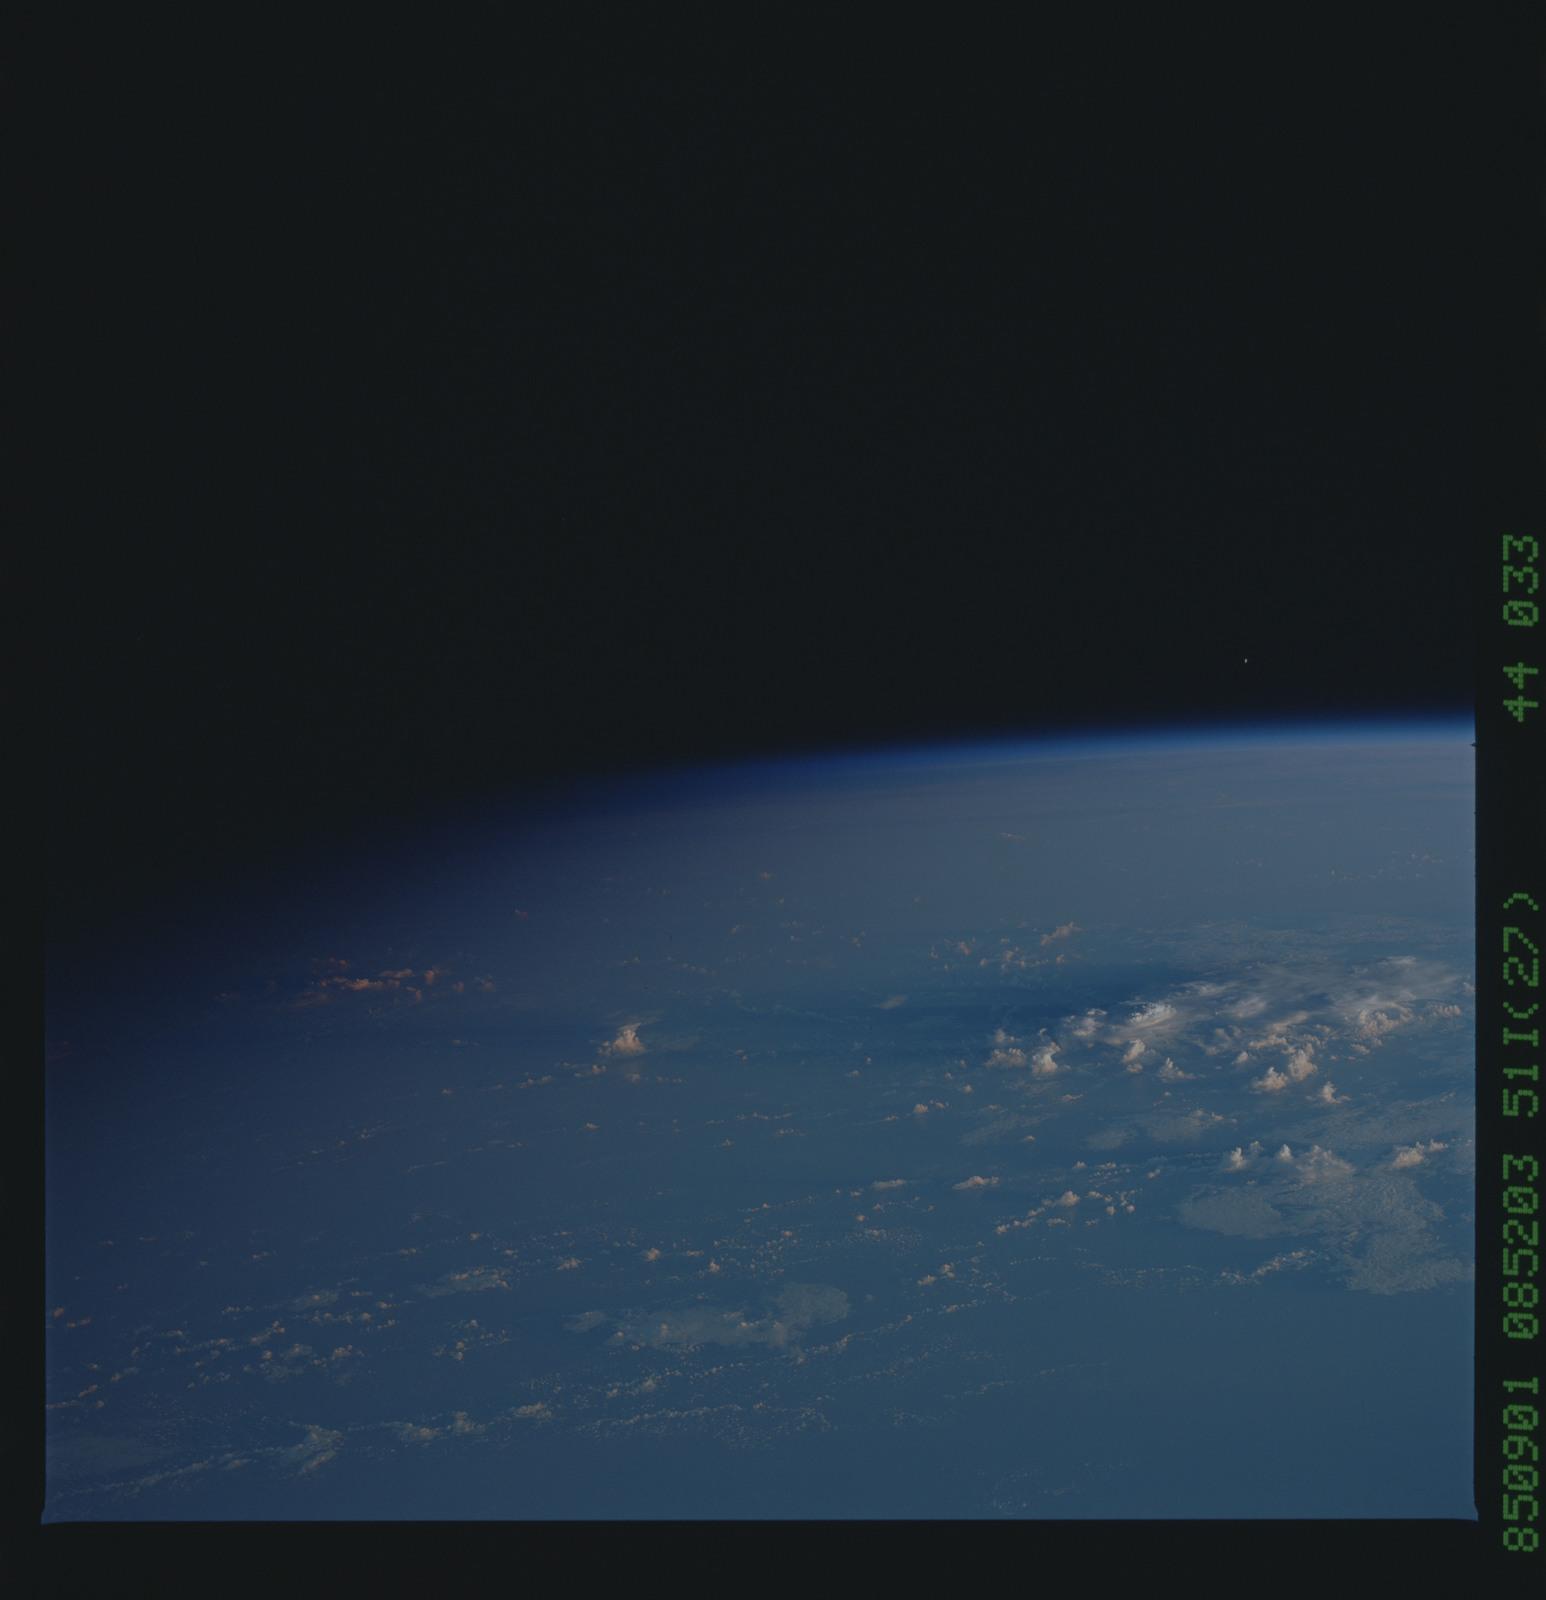 51I-44-033 - STS-51I - STS-51I earth observations